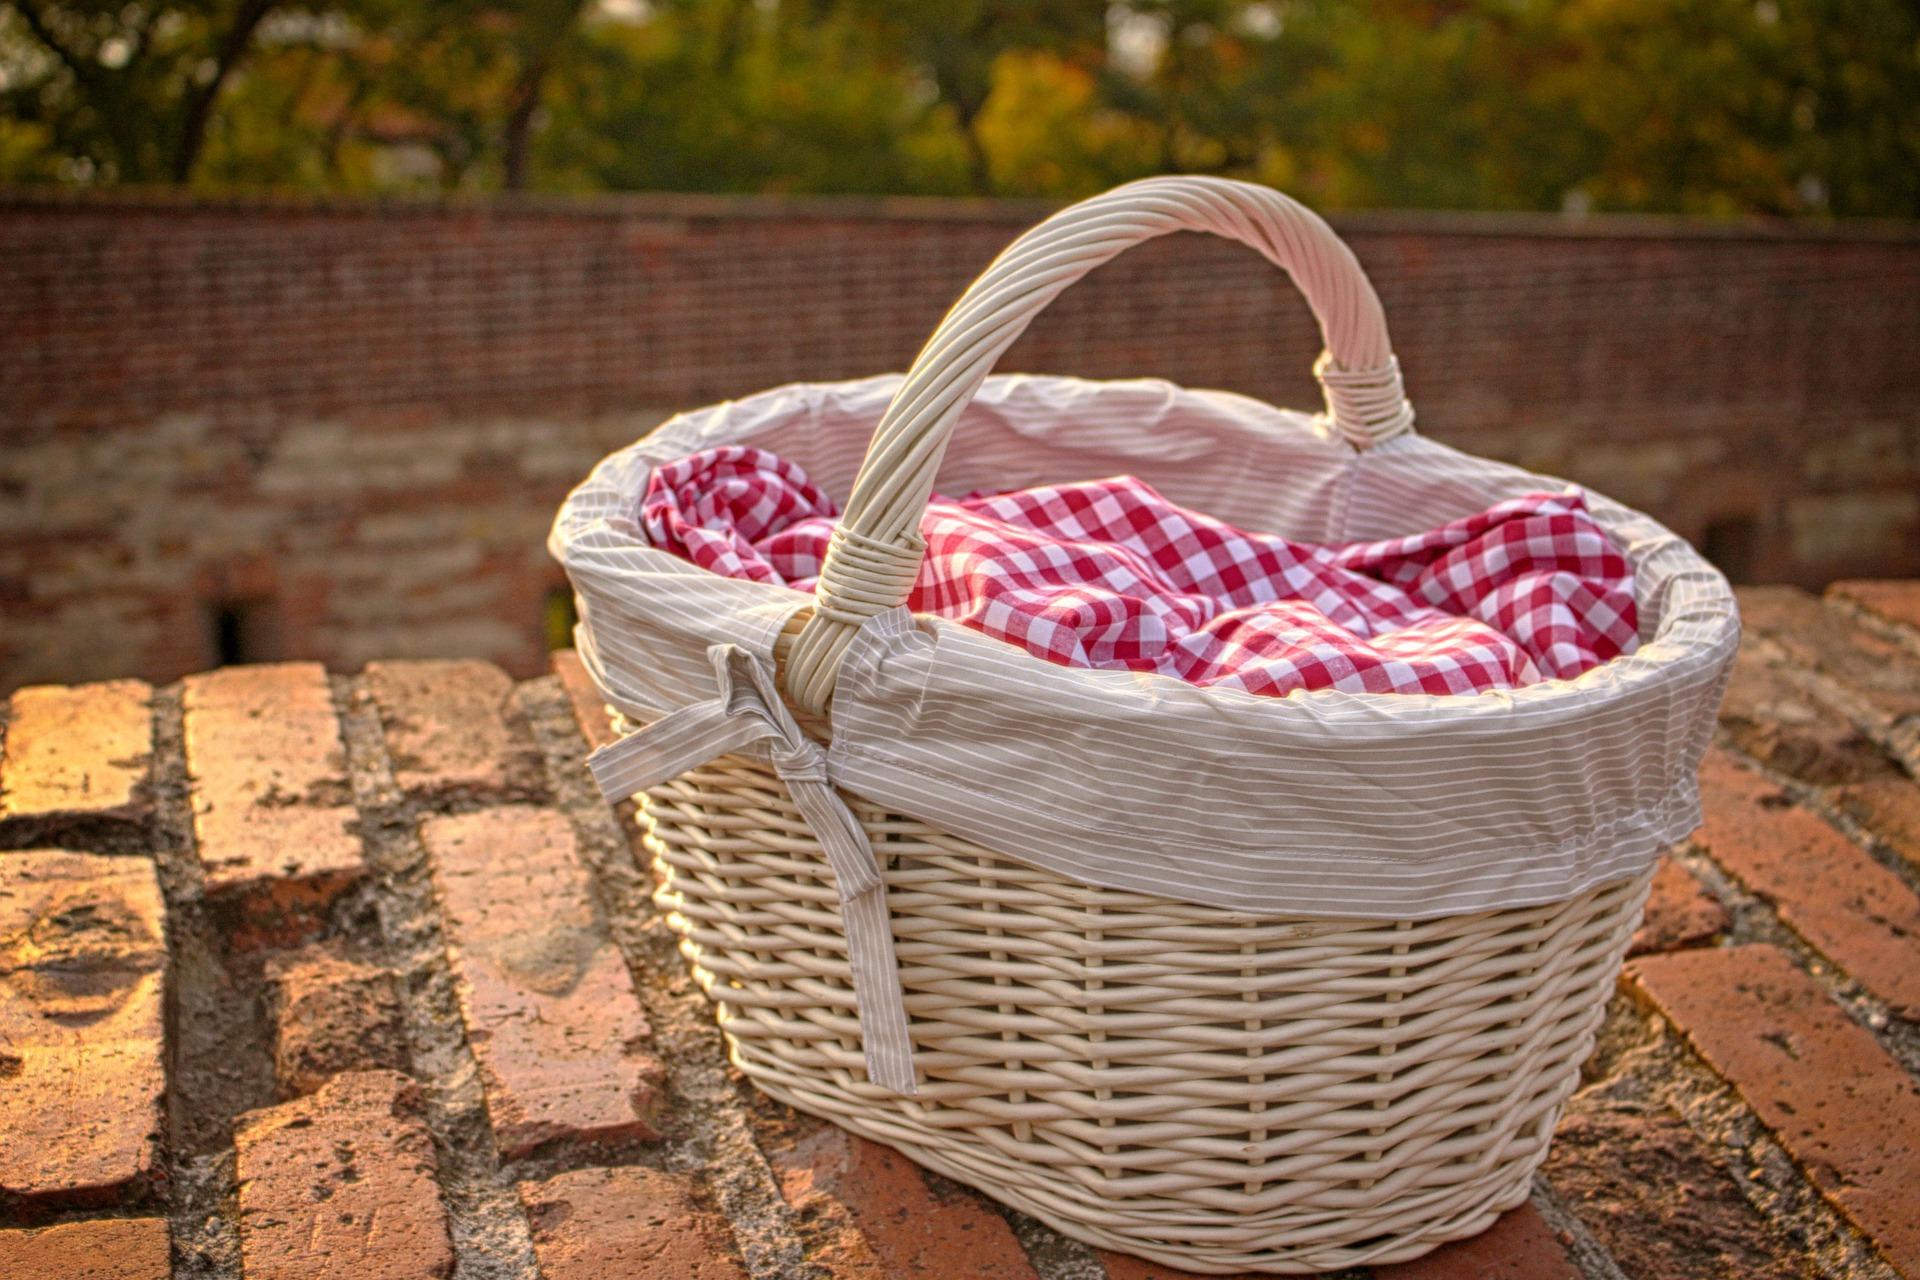 basket-2594872_1920.jpg